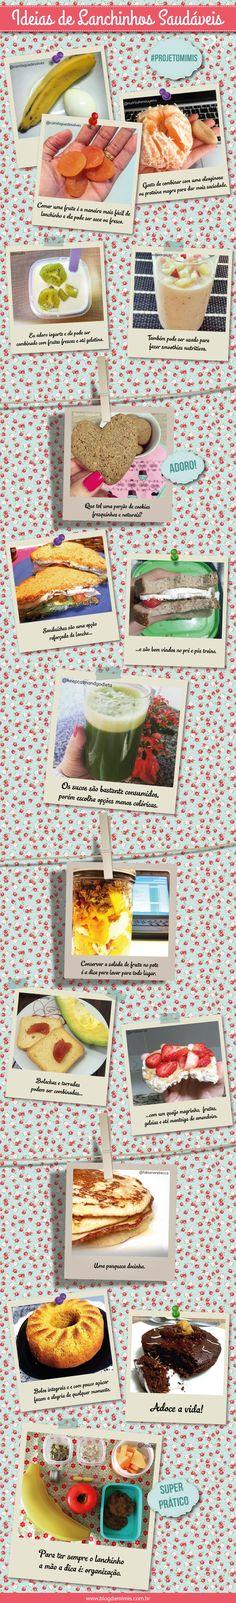 Ideias-de-lanchinhos-saudáveis-blog-da-mimis-michelle-franzoni-post